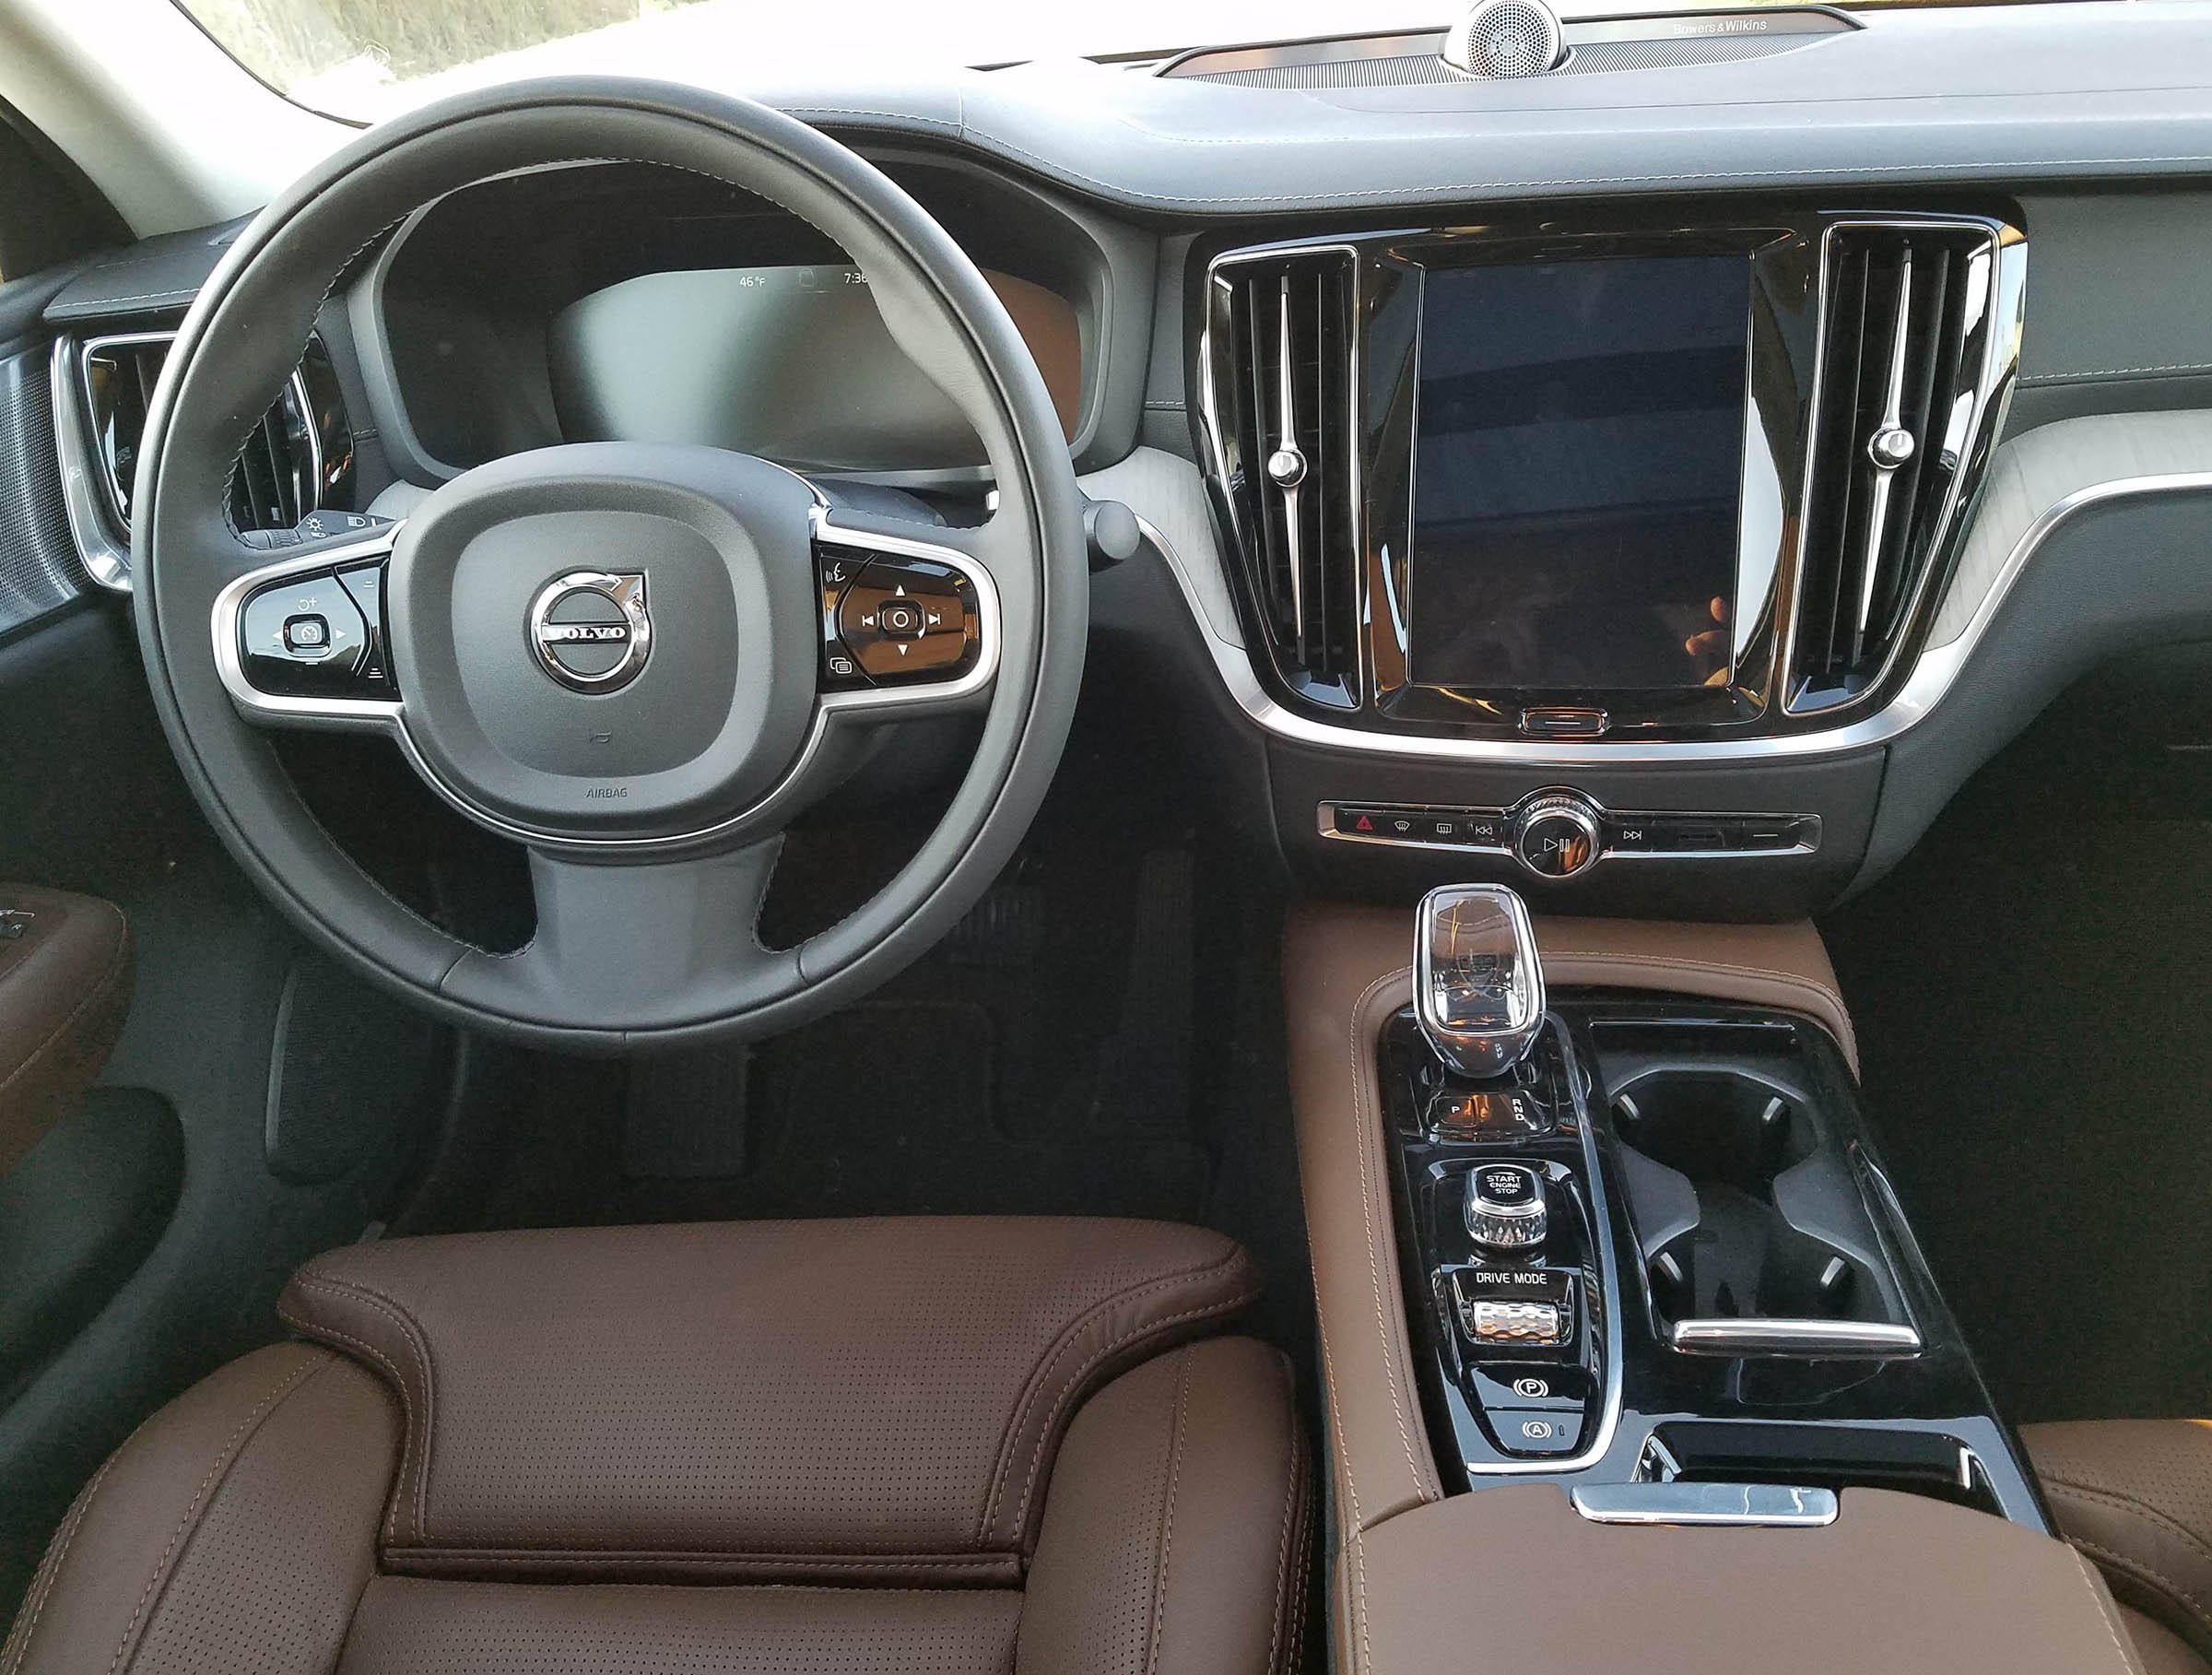 2020 Volvo S60 T8 E Awd Inscription Review Wuwm